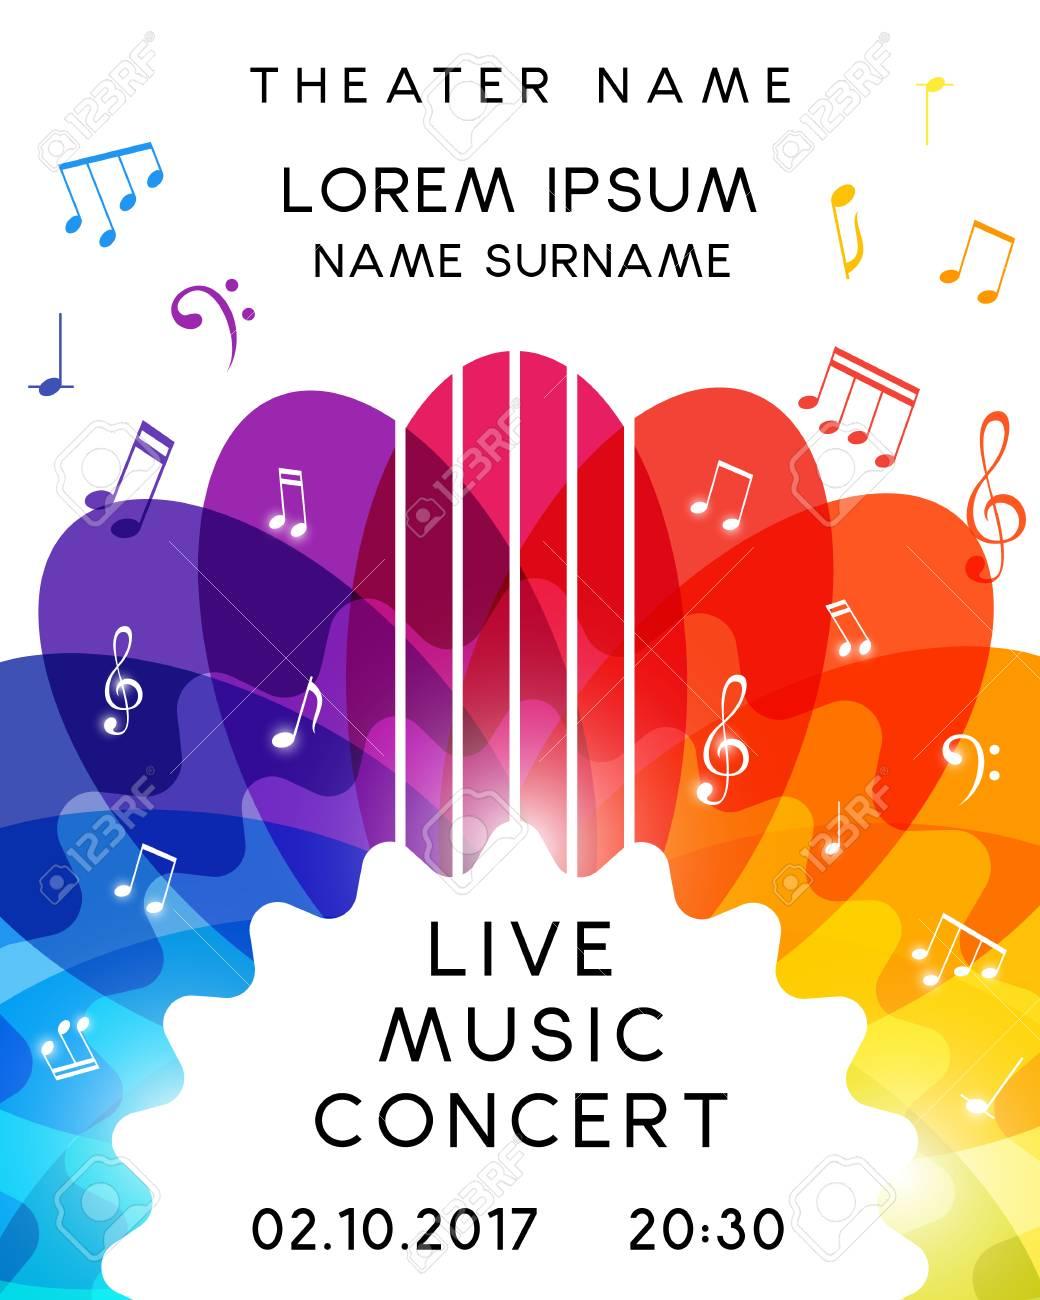 Music concert poster design. Vector template for flyer, banner, invitation. - 86920809